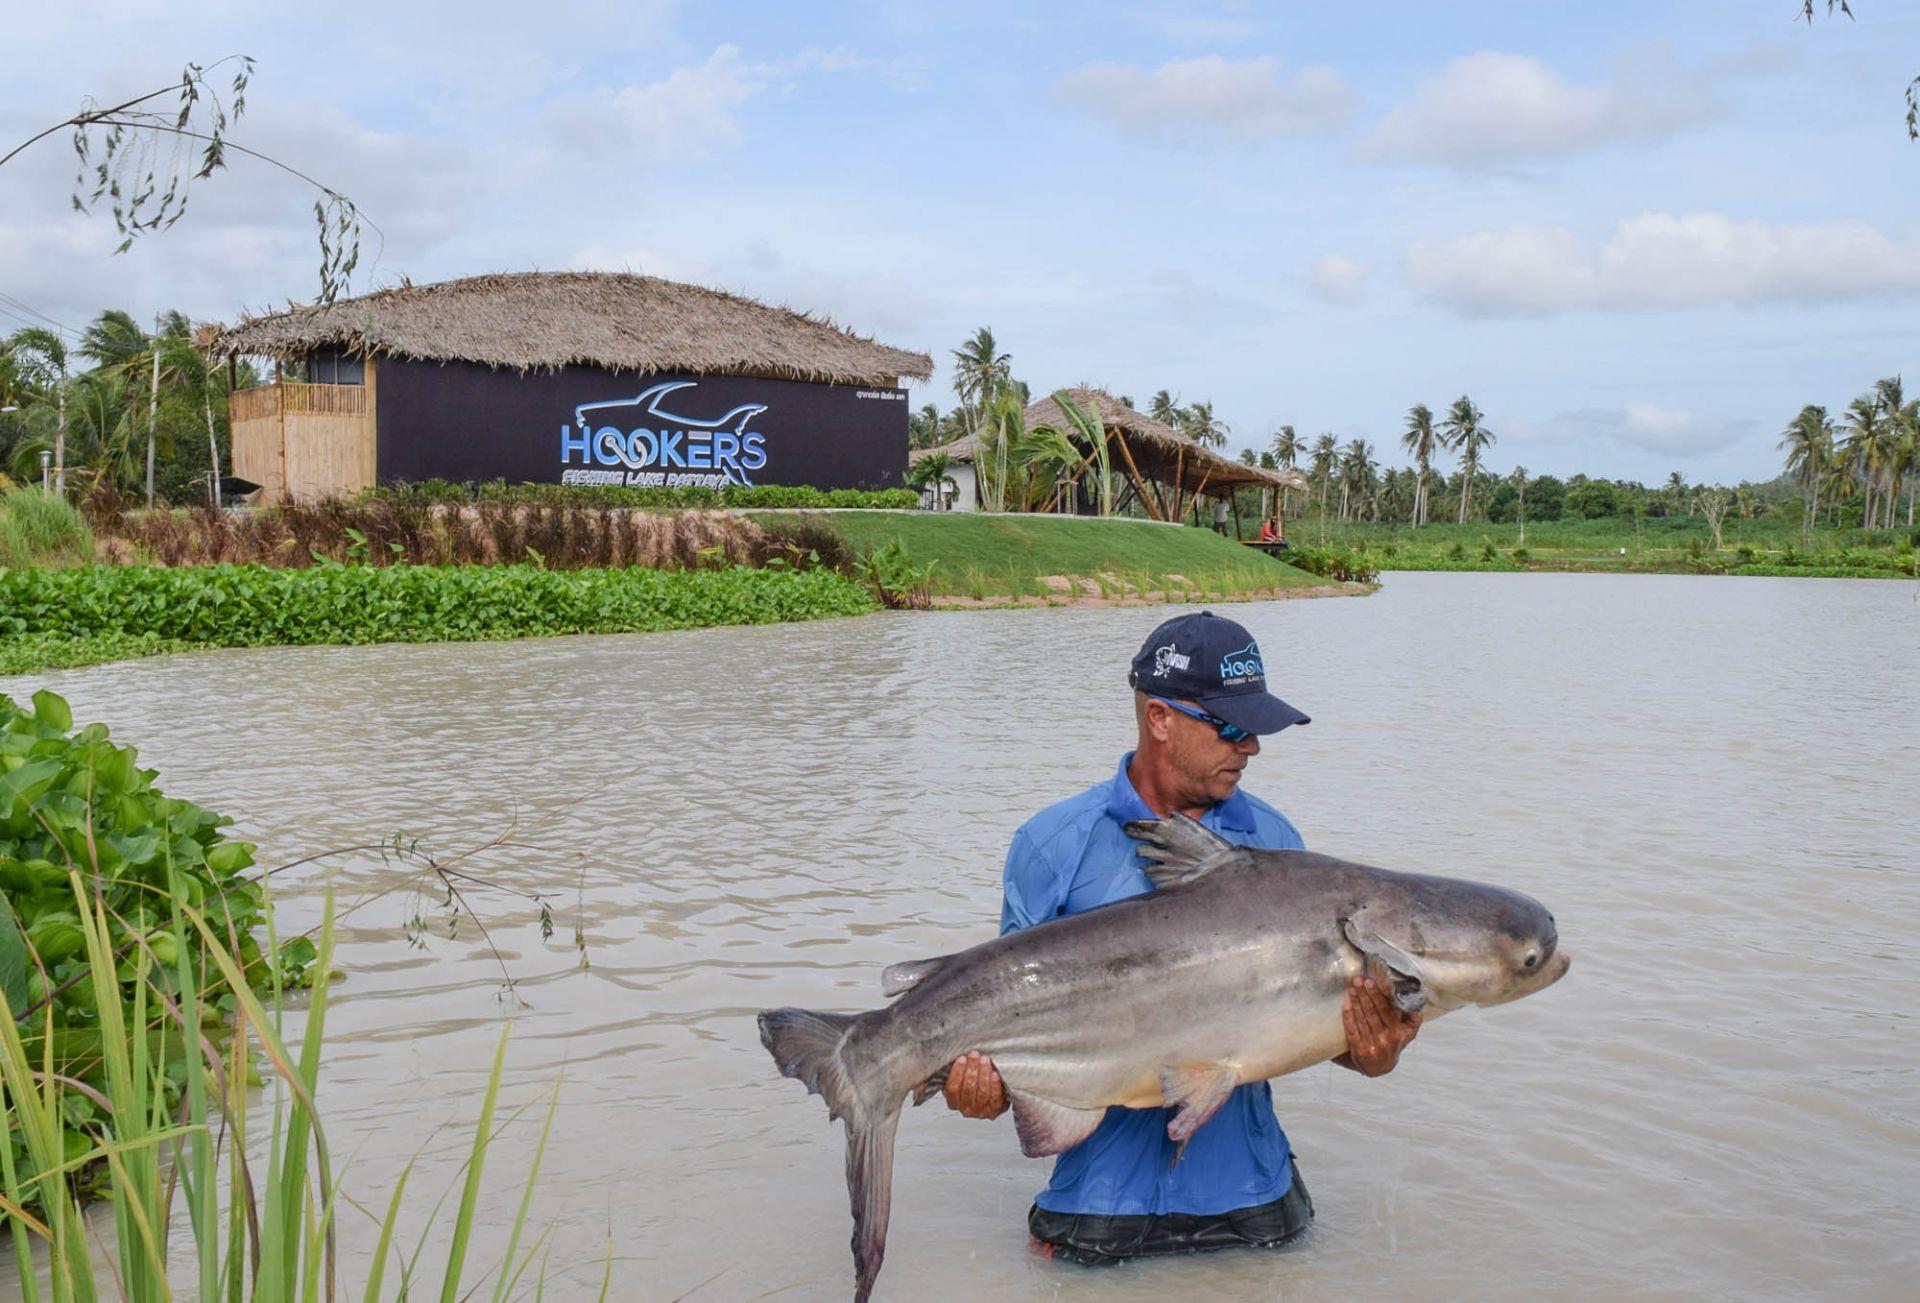 chaopraya cat fish at hookers fishing lake pattaya